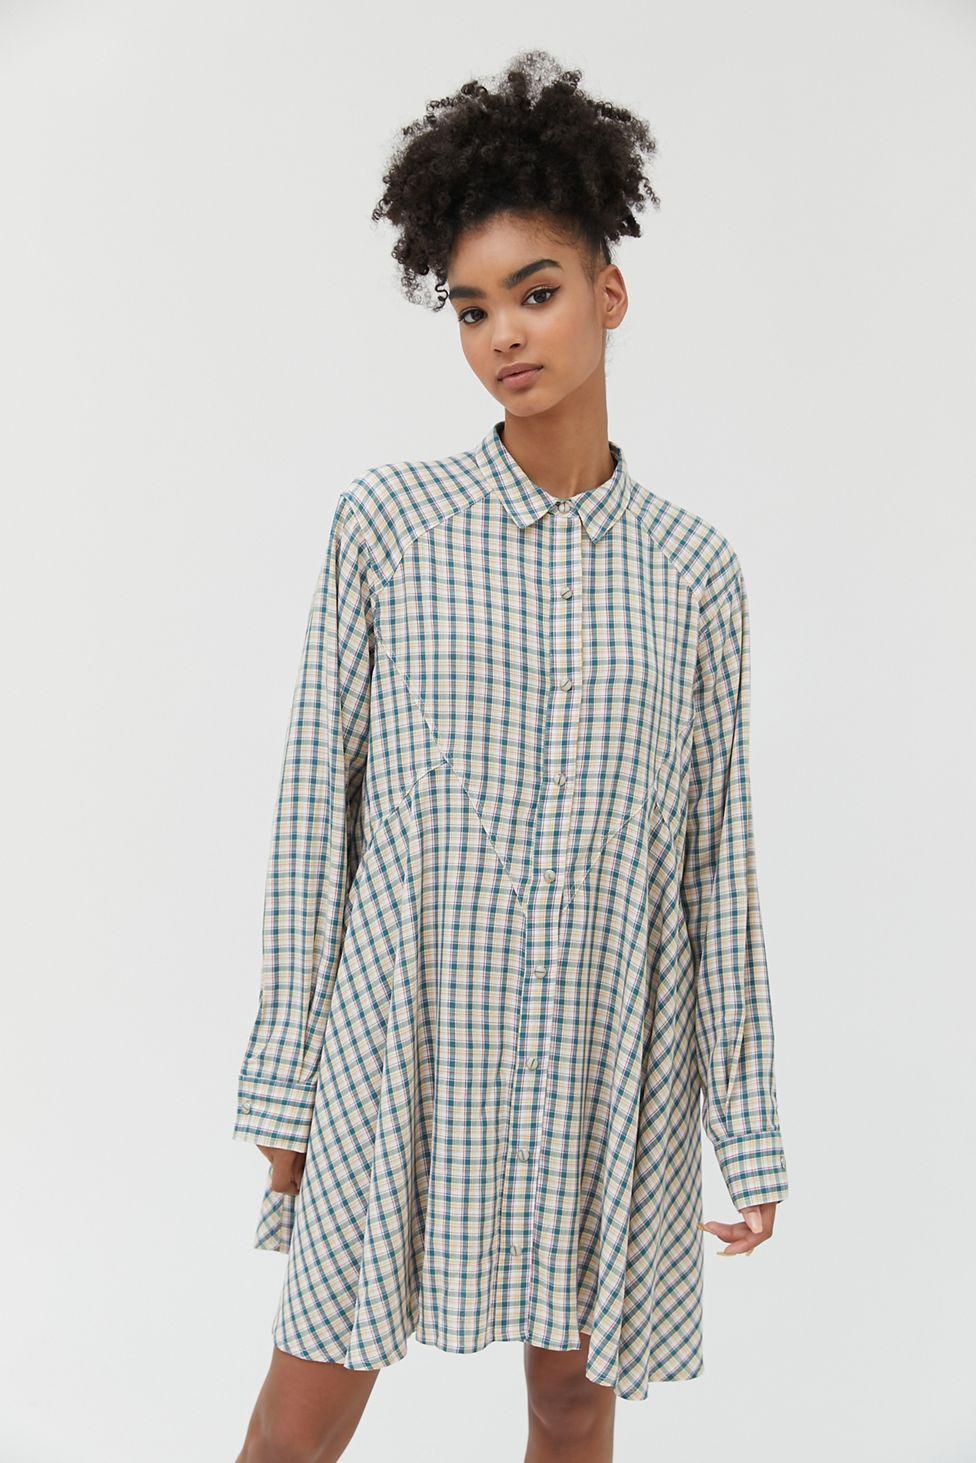 Bdg Amika Long Sleeve Shirt Dress Urban Outfitters Dress Shirt Sleeves Long Sleeve Shirts Long Sleeve Shirt Dress [ 1463 x 976 Pixel ]